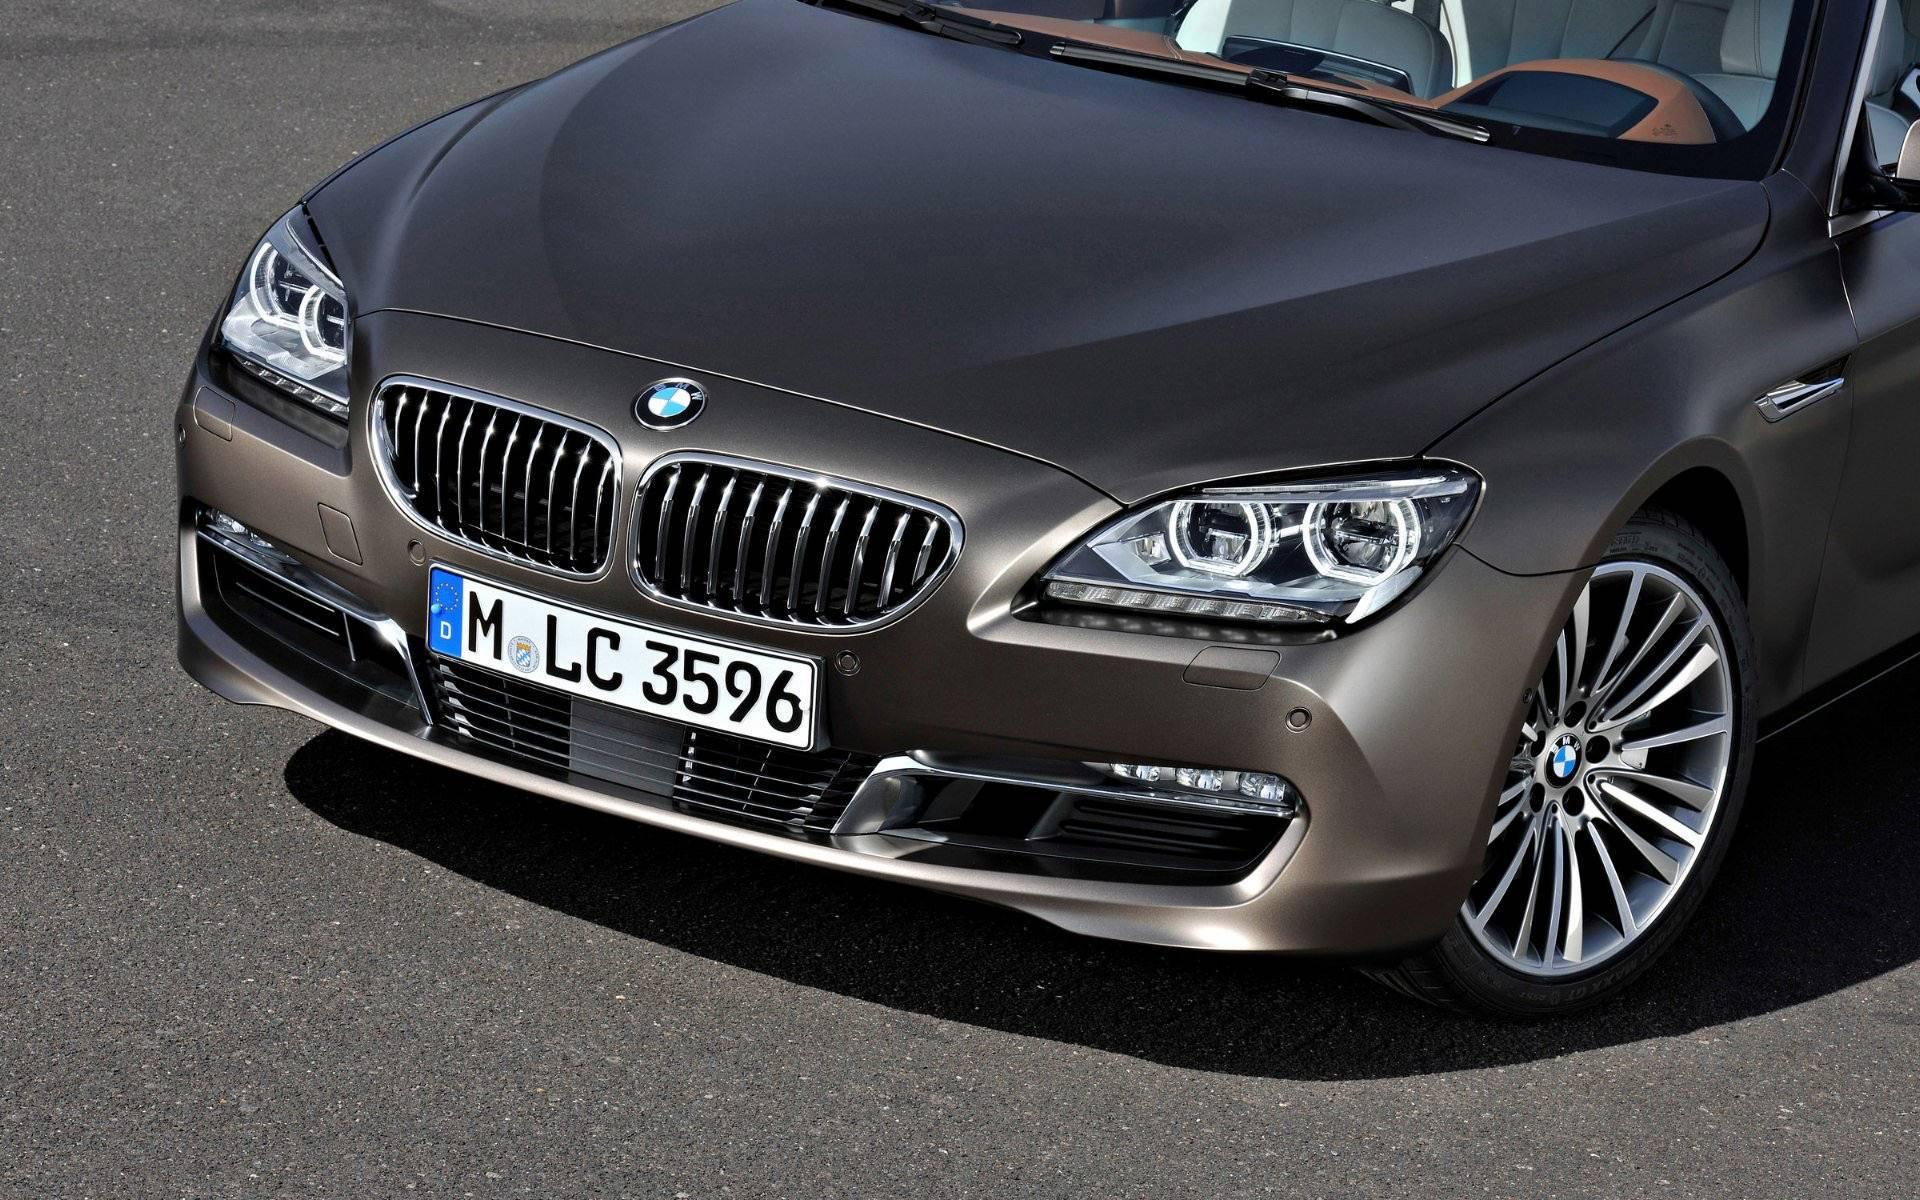 wallpaper: 2013 BMW 6 Series Wallpapers